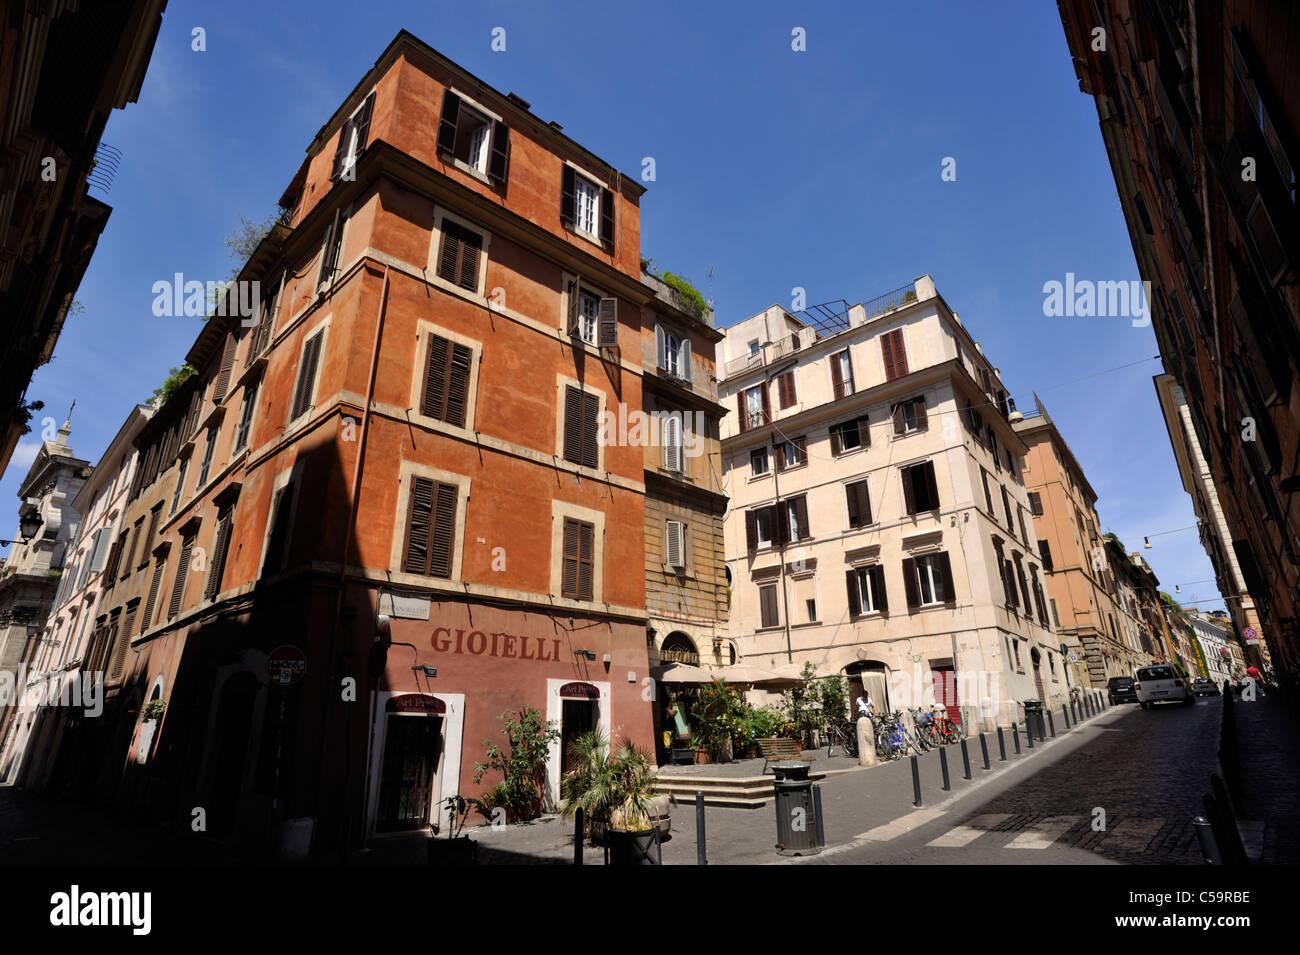 Italien, Rom, Monti Viertel, Via dell'angeletto Stockbild